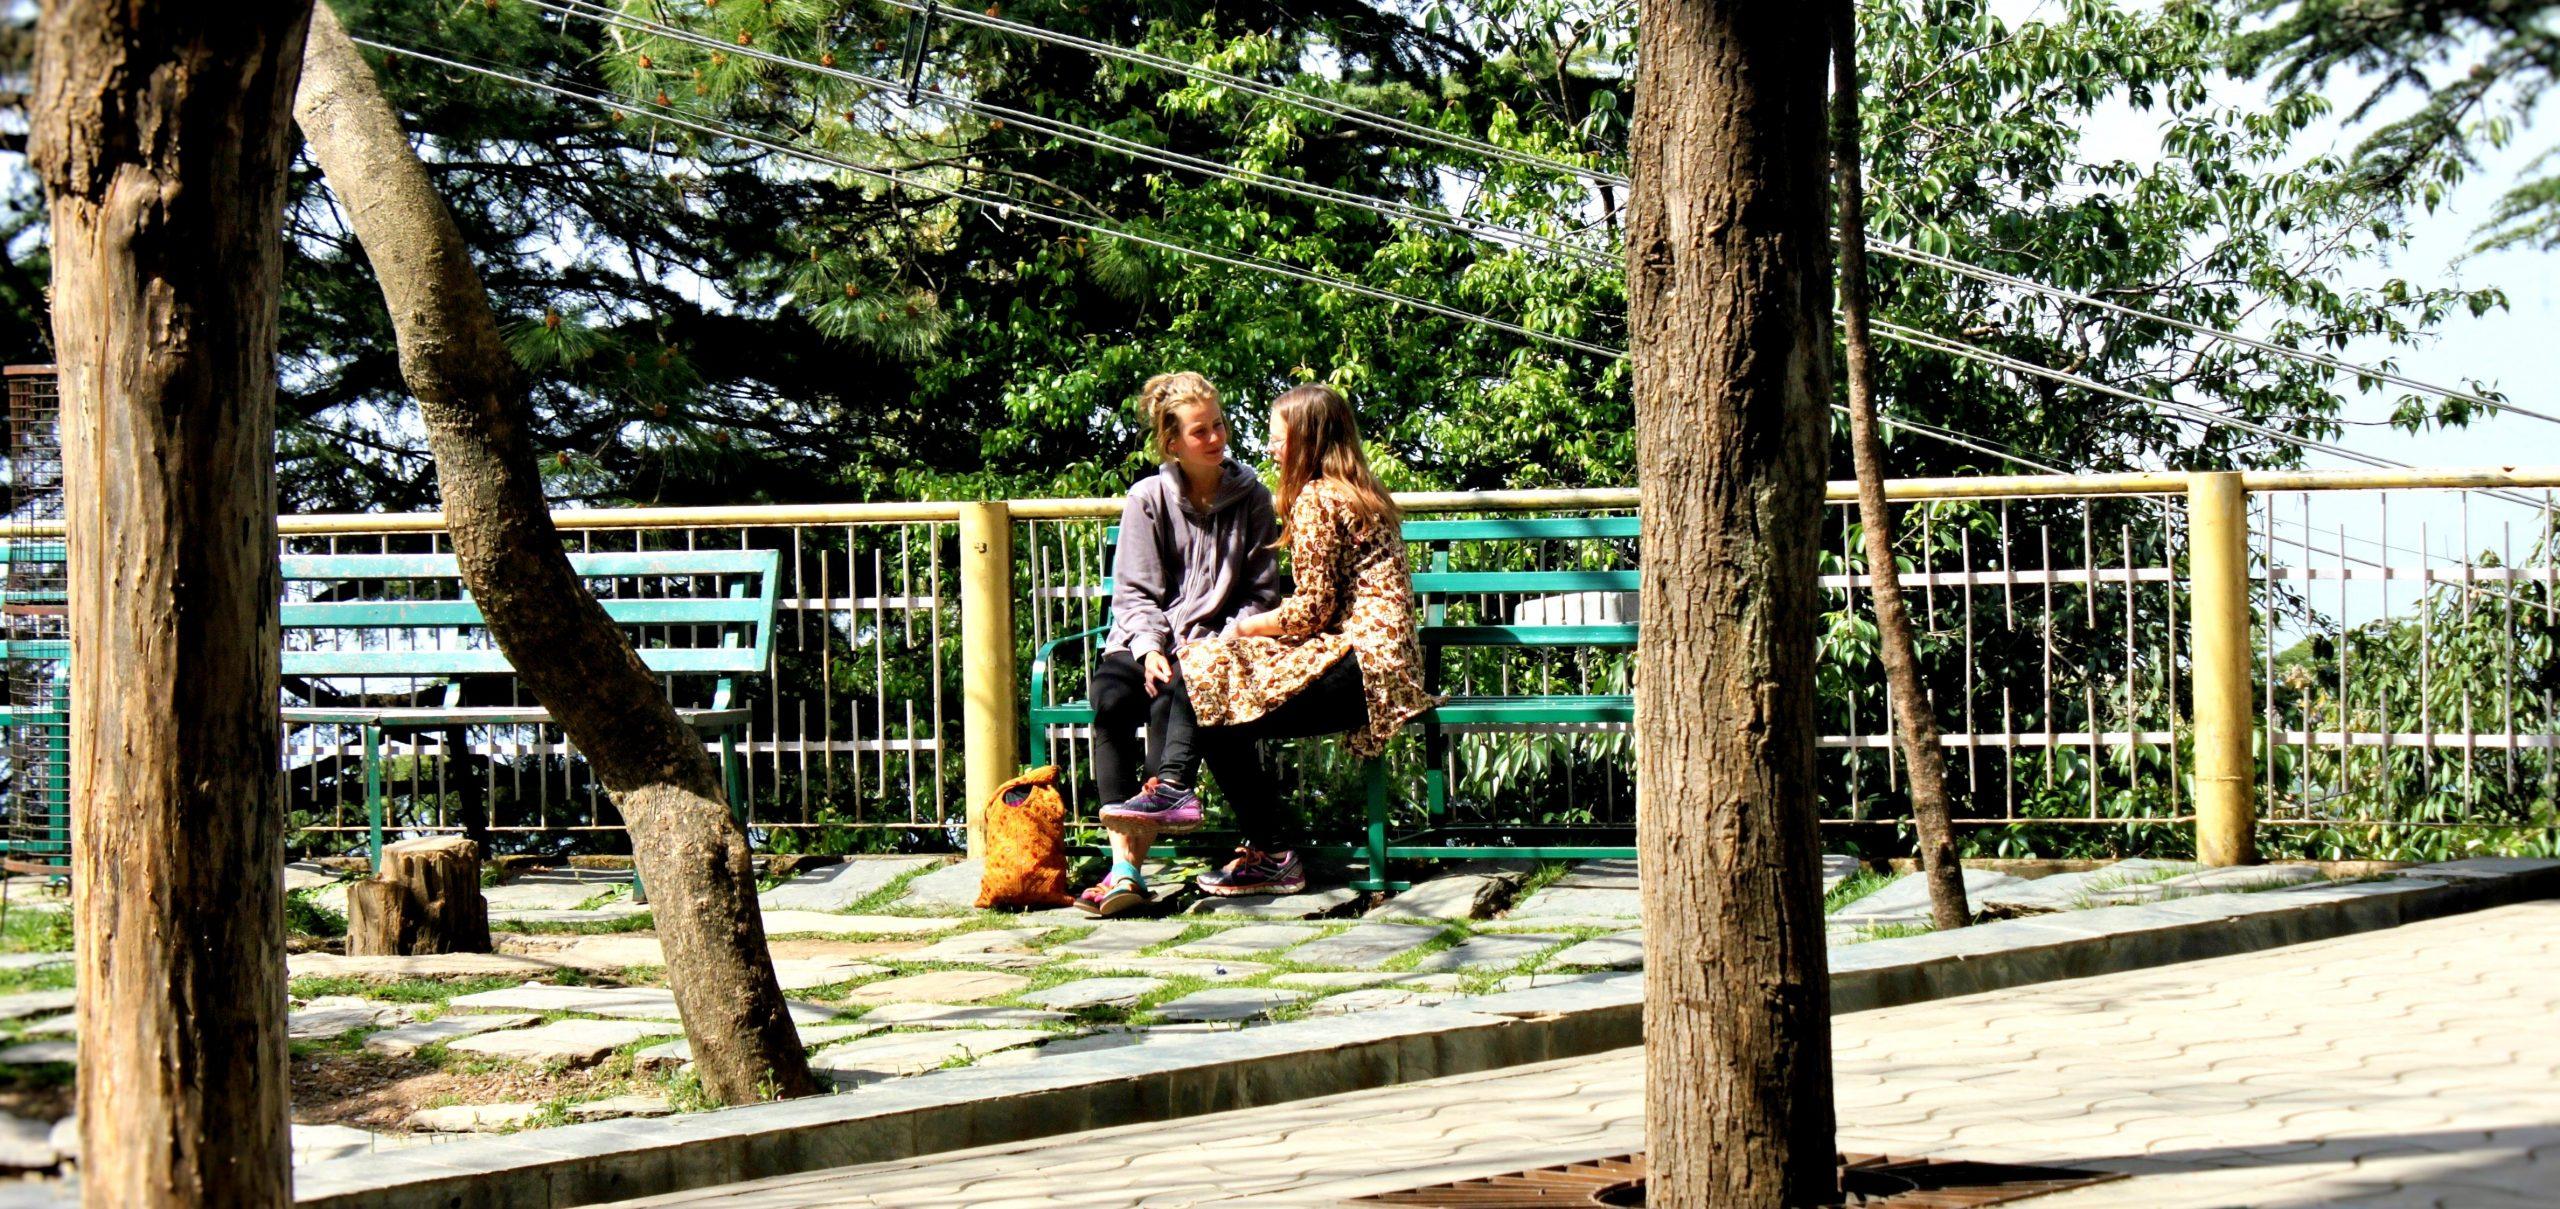 Two girls sitting on bench near railing